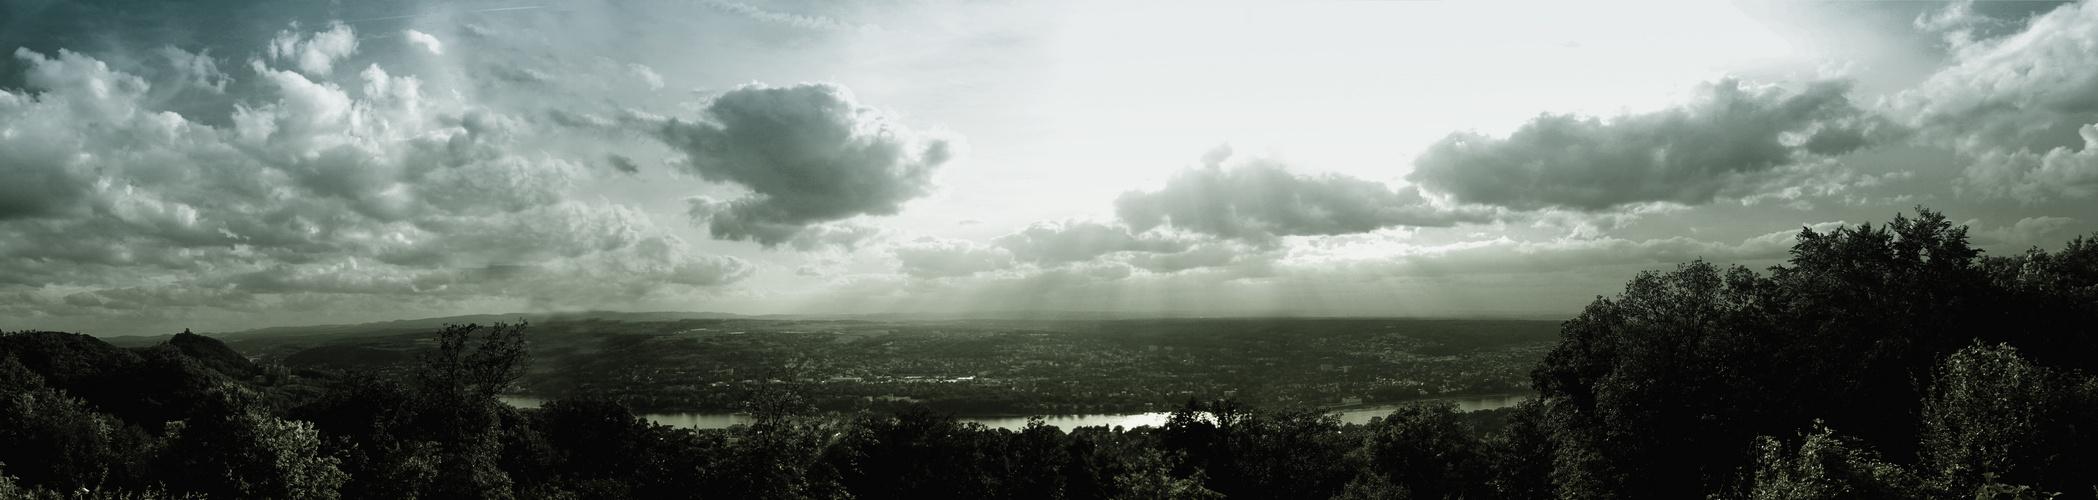 mein erstes Panorama